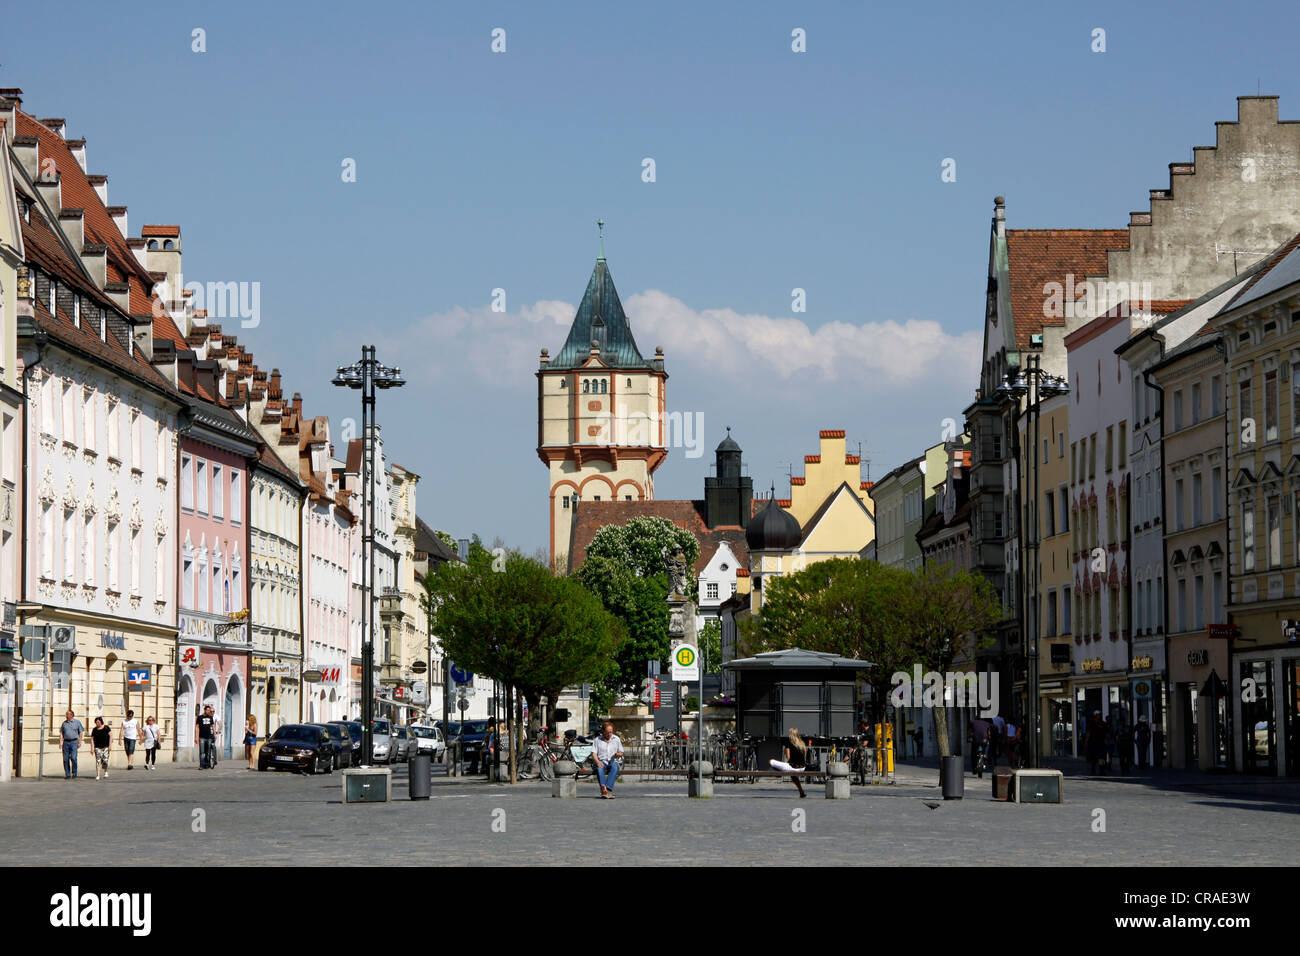 Pedestrian zone, city square, city centre of Straubing, Bavaria, Germany, Europe - Stock Image